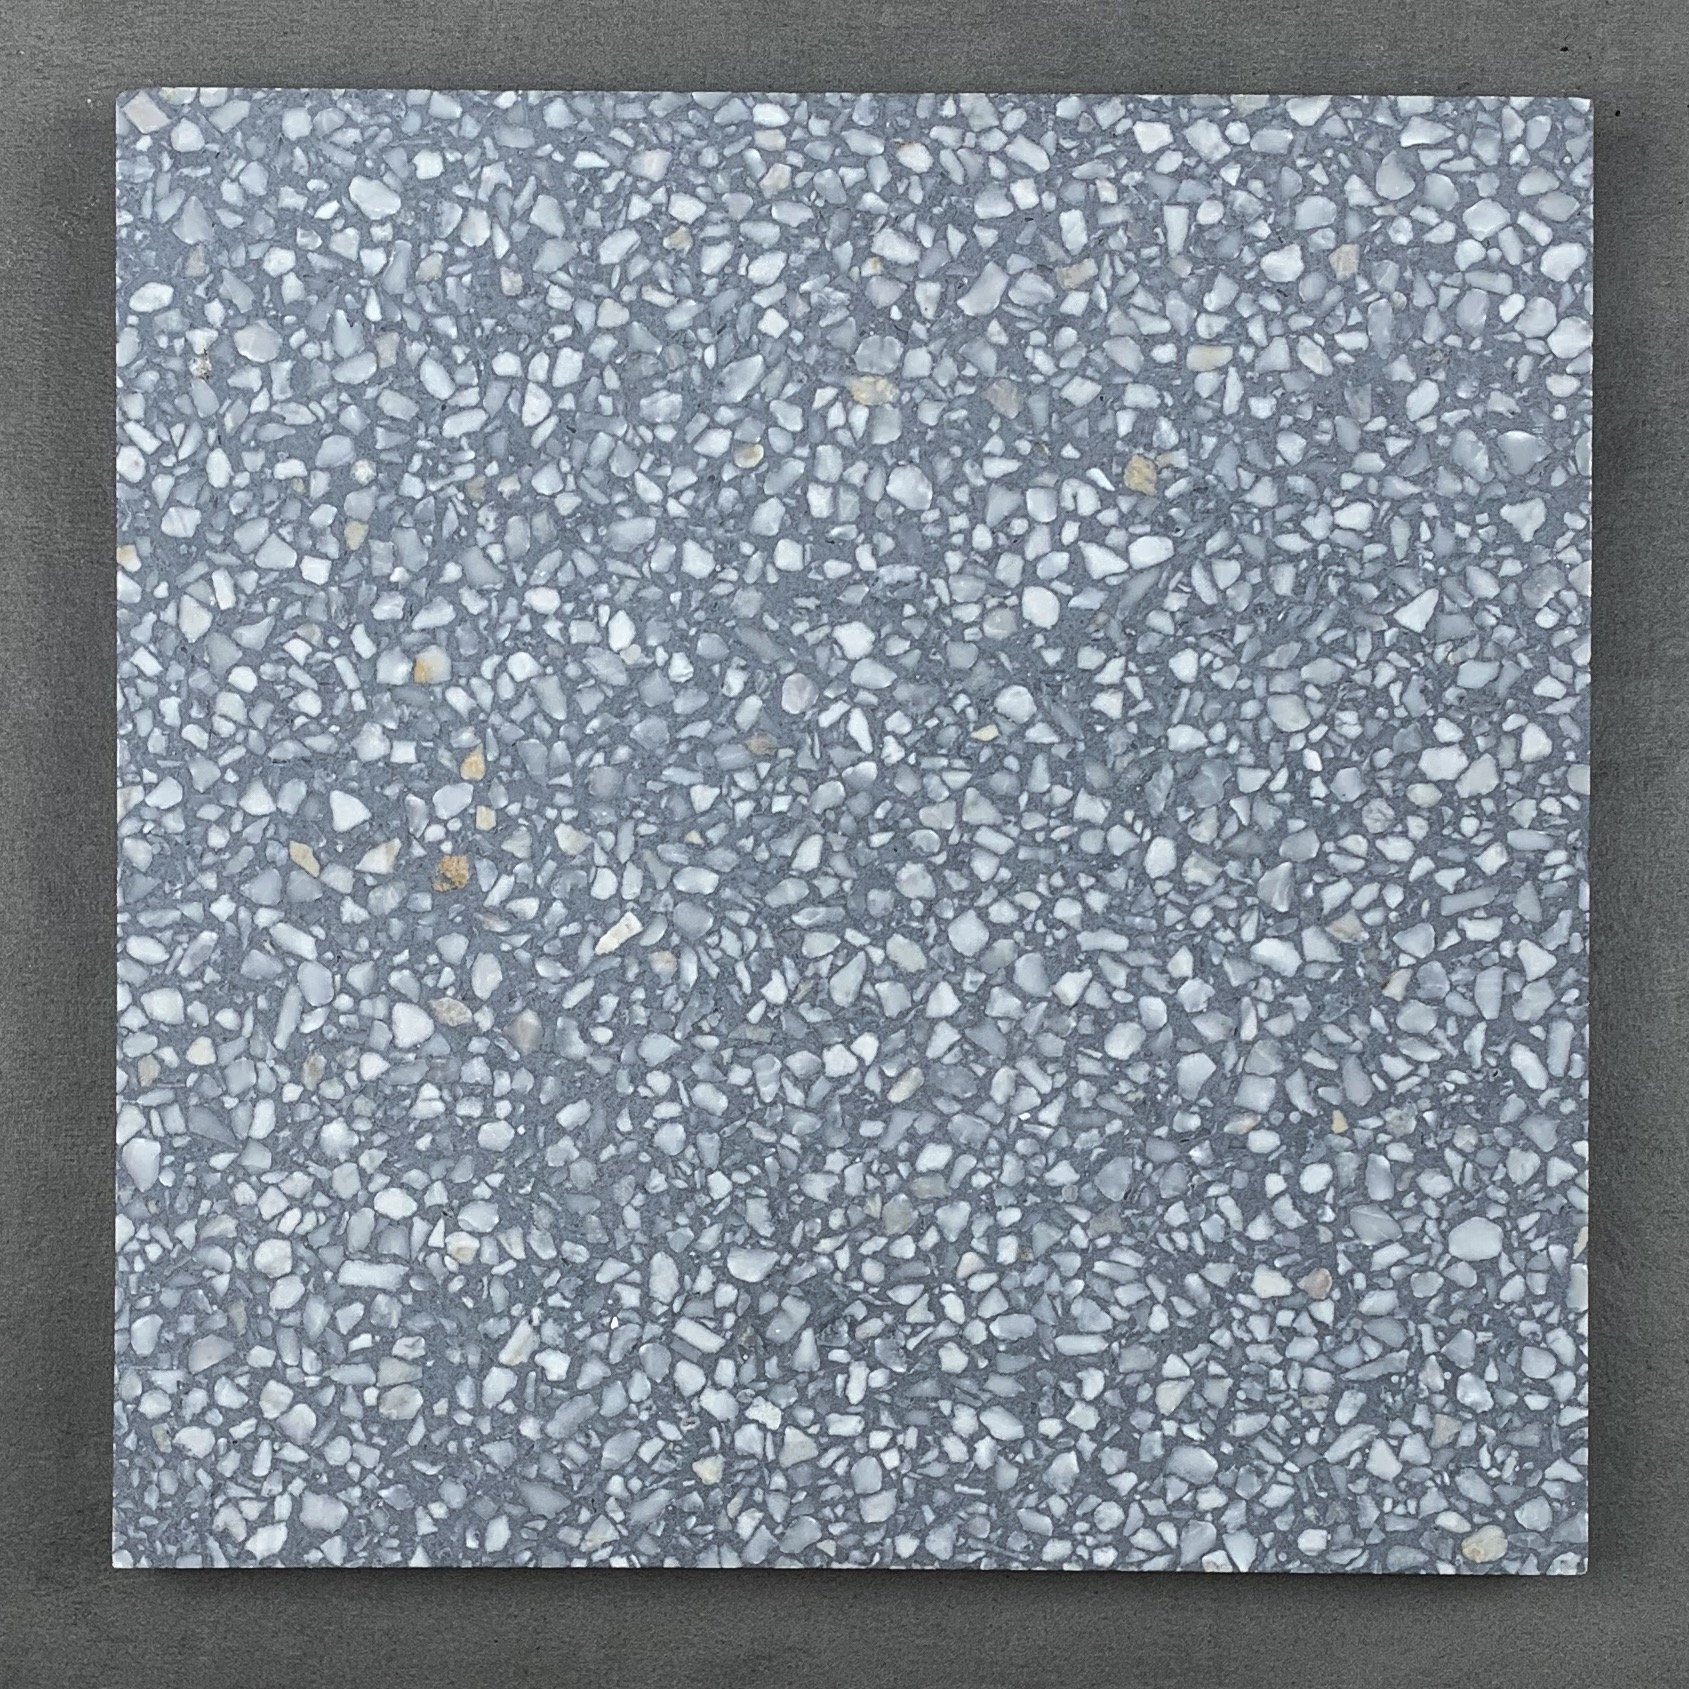 Pompei Terrazzo Tiles